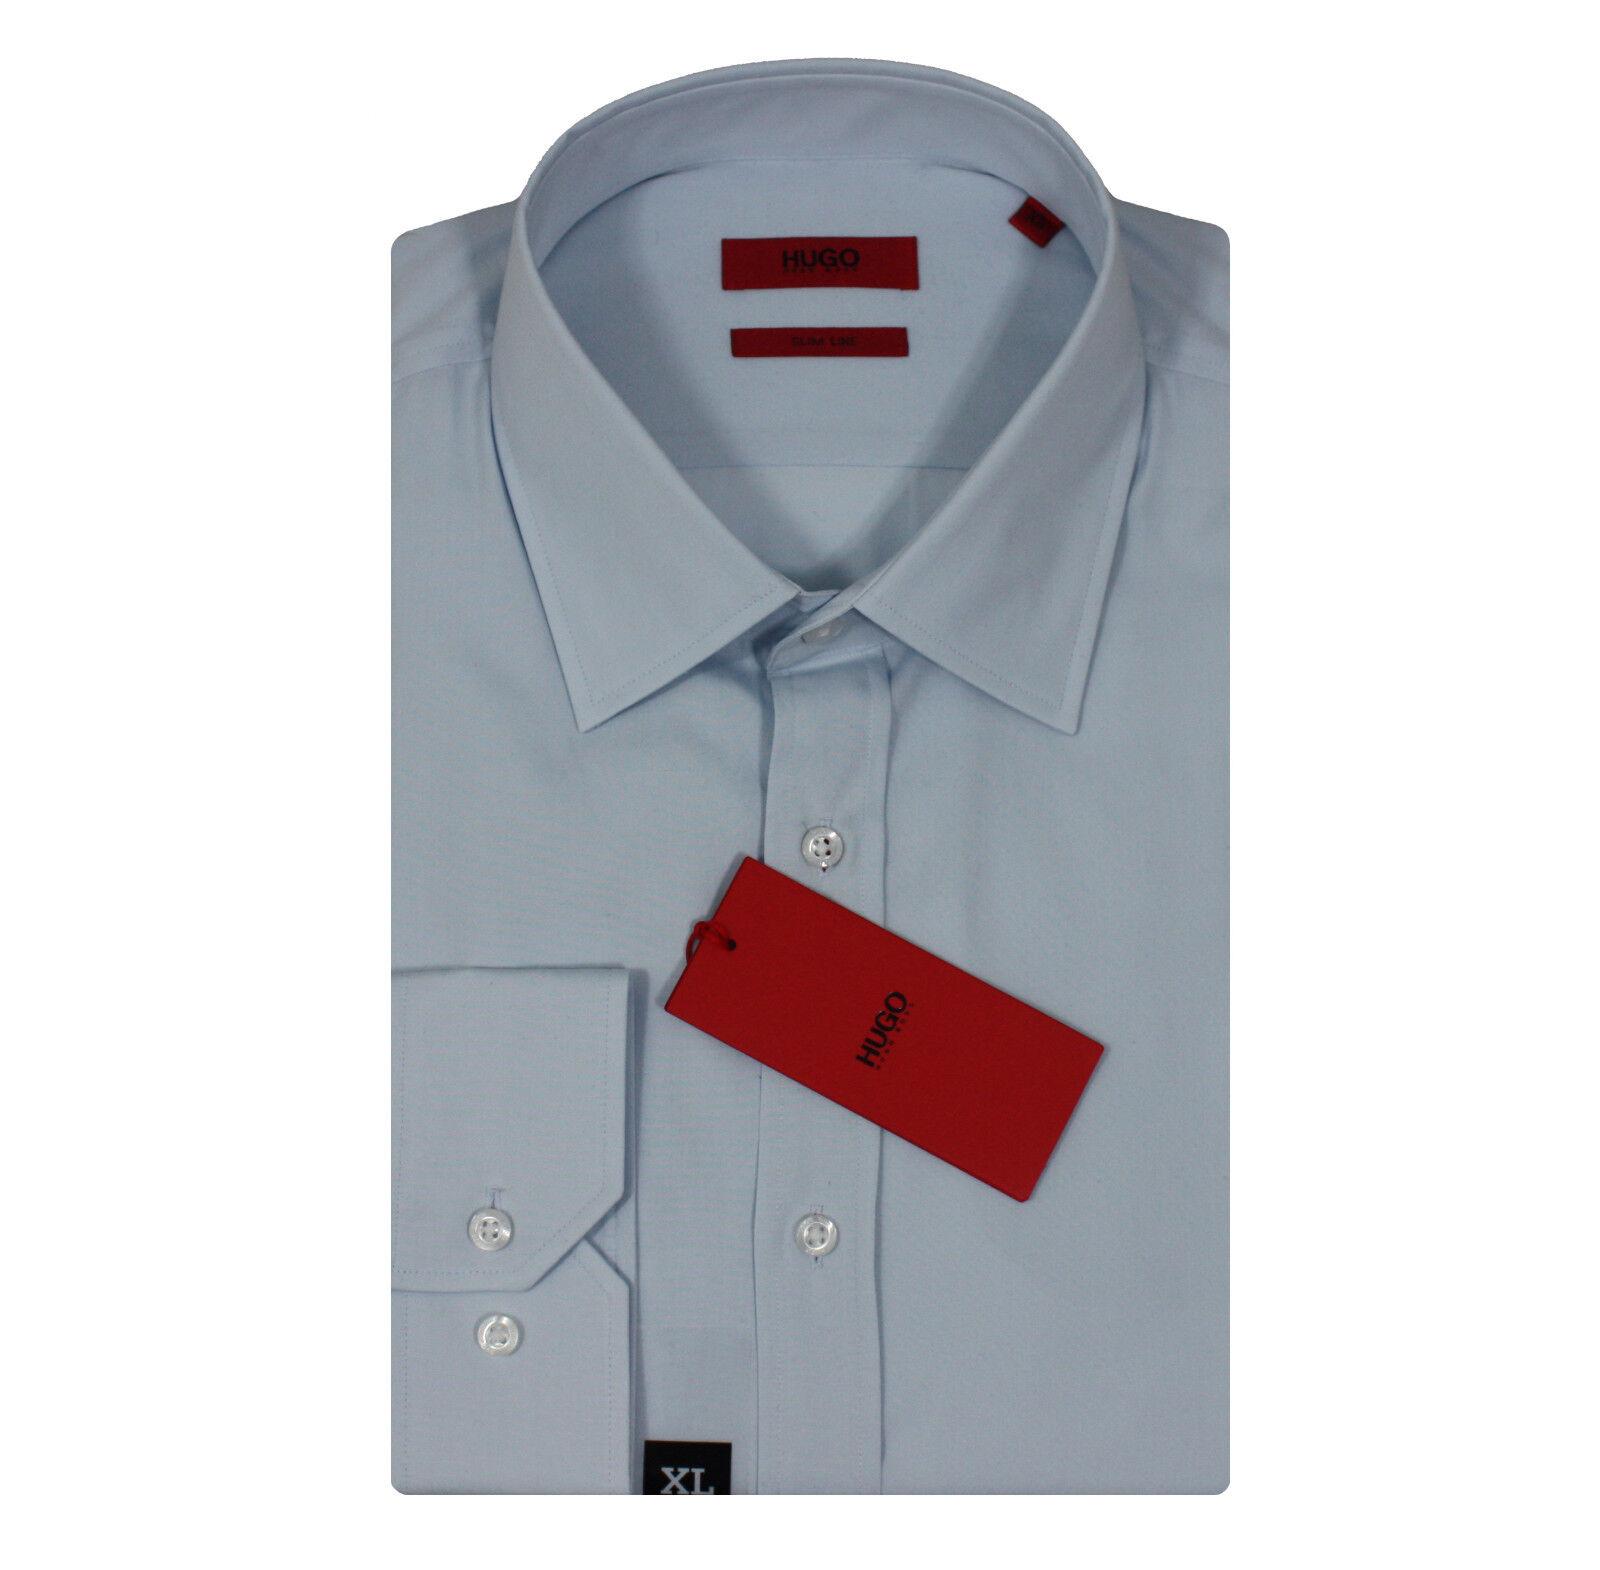 HUGO BOSS Hemd Business-Hemd Gr. XL NEU  Slim Fit   50162797